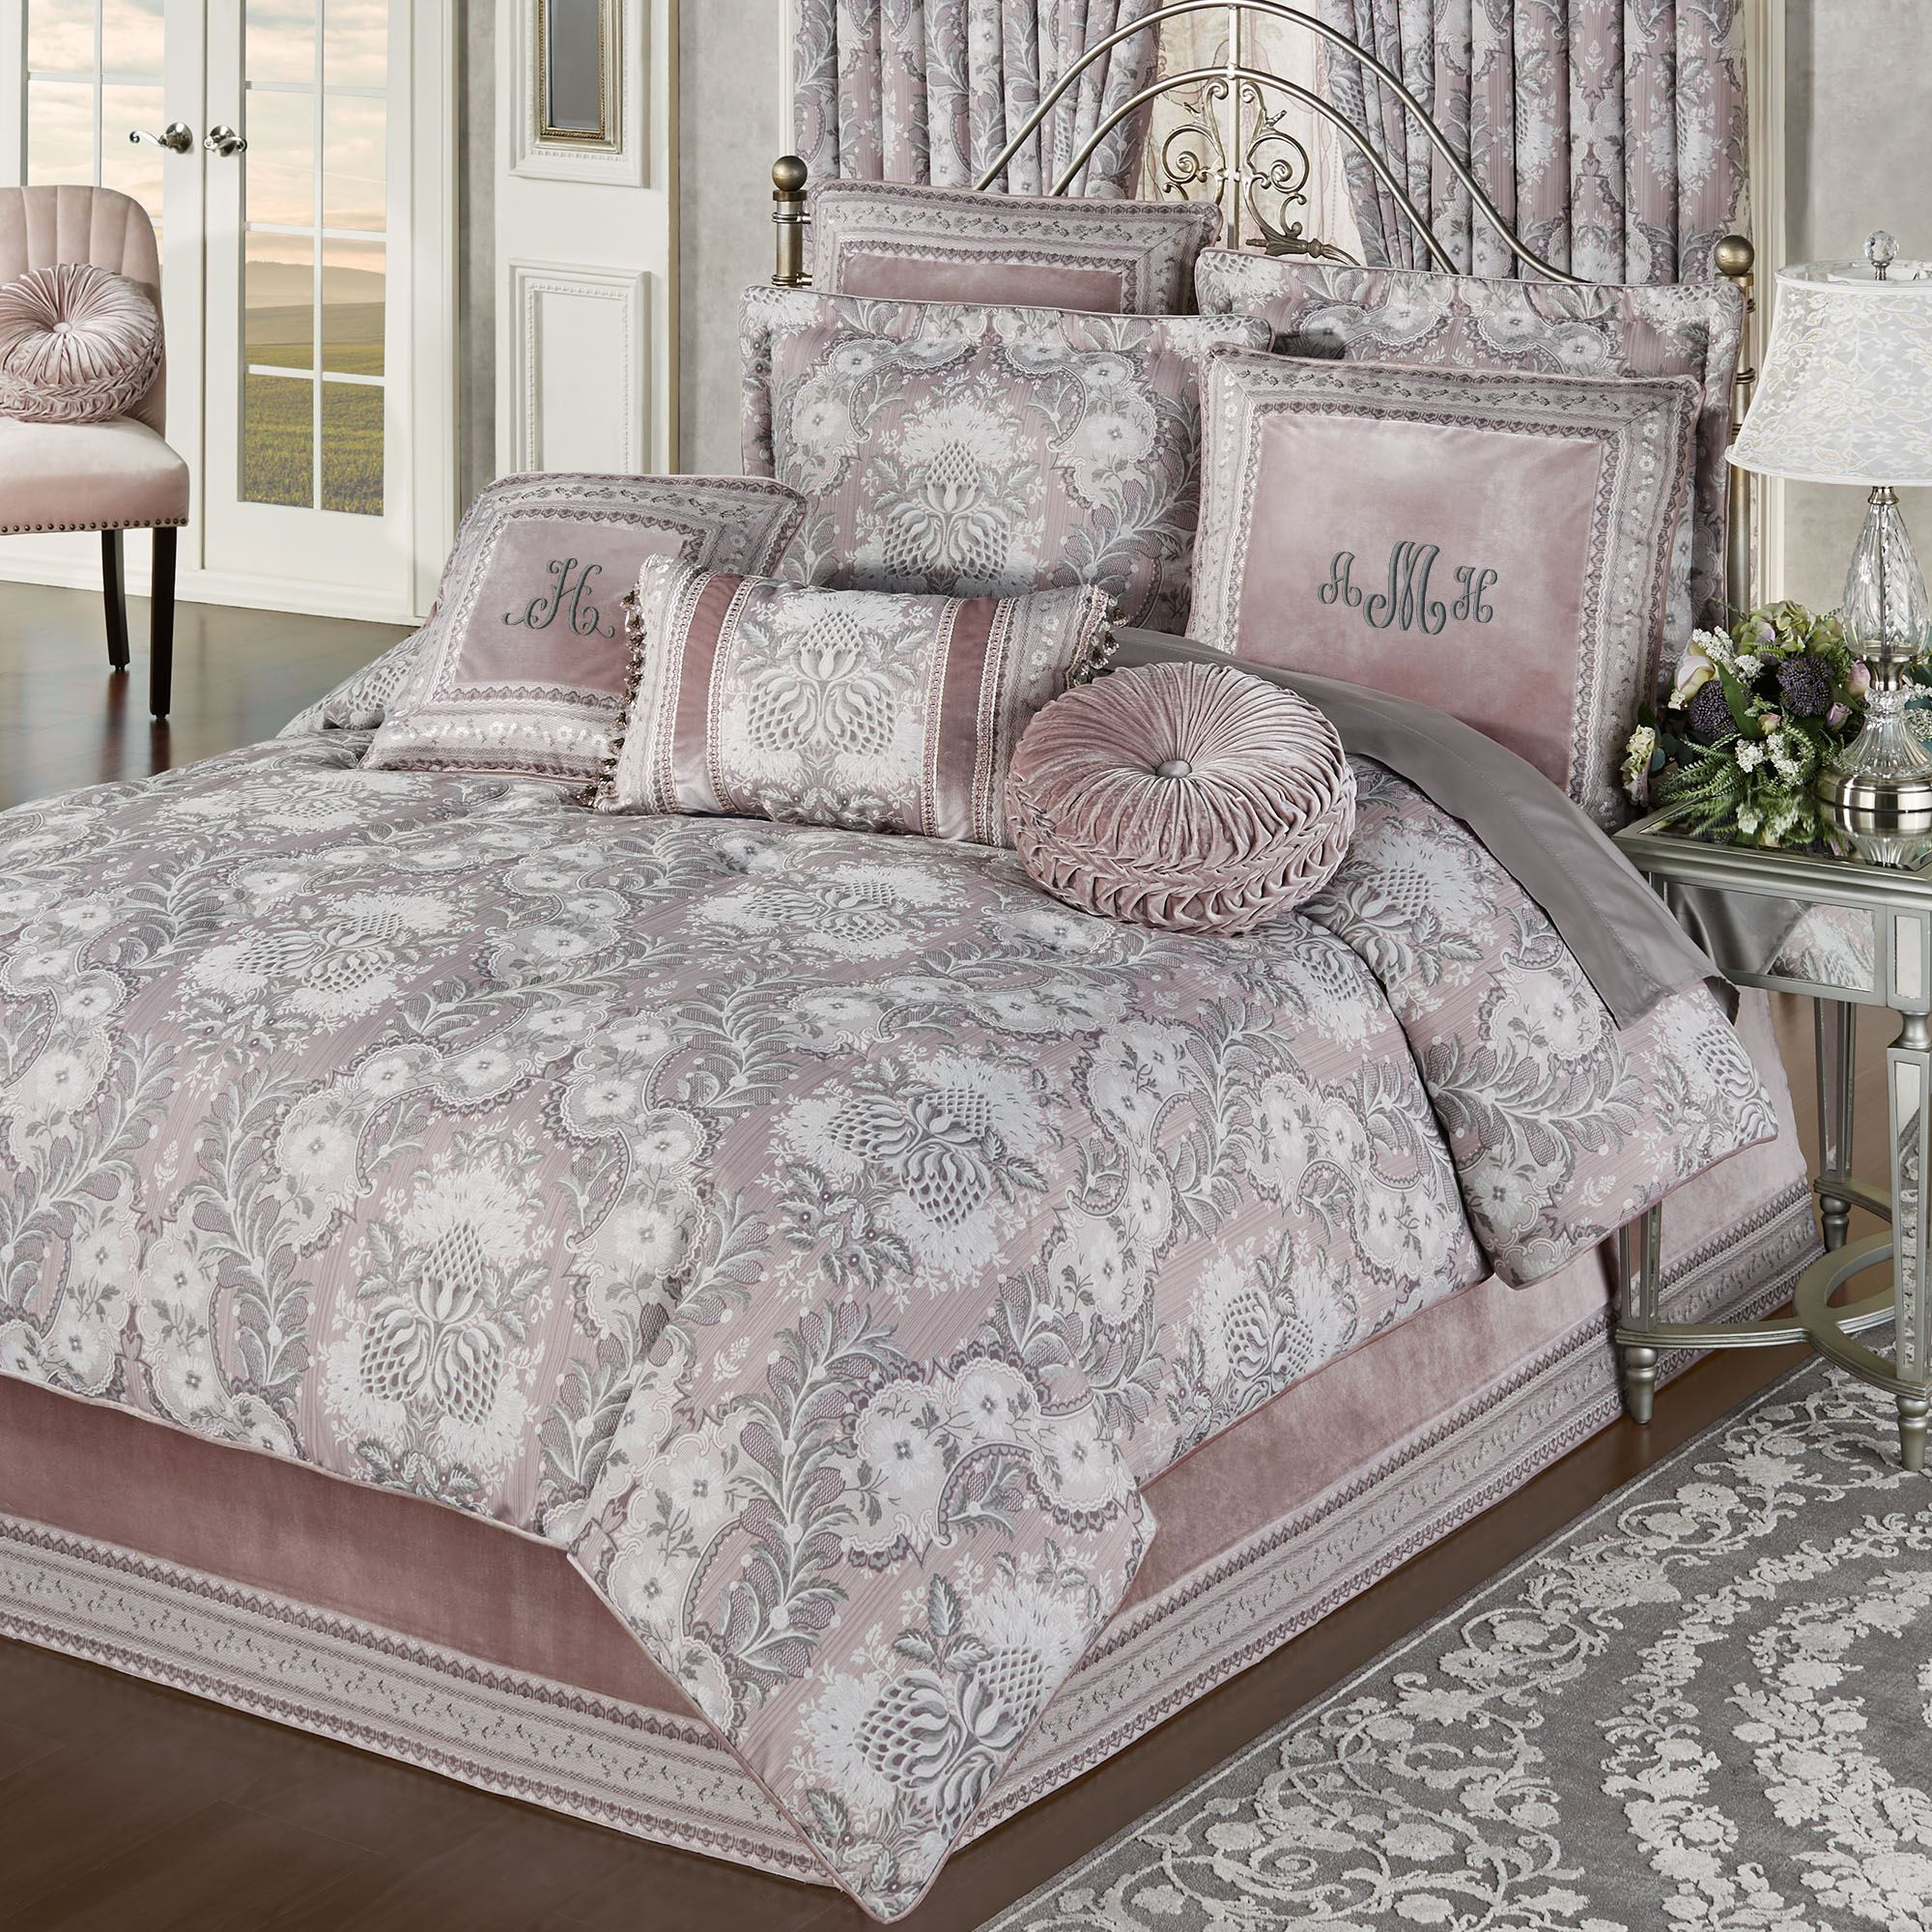 Marseille Acanthus Leaf Lilac Comforter Bedding